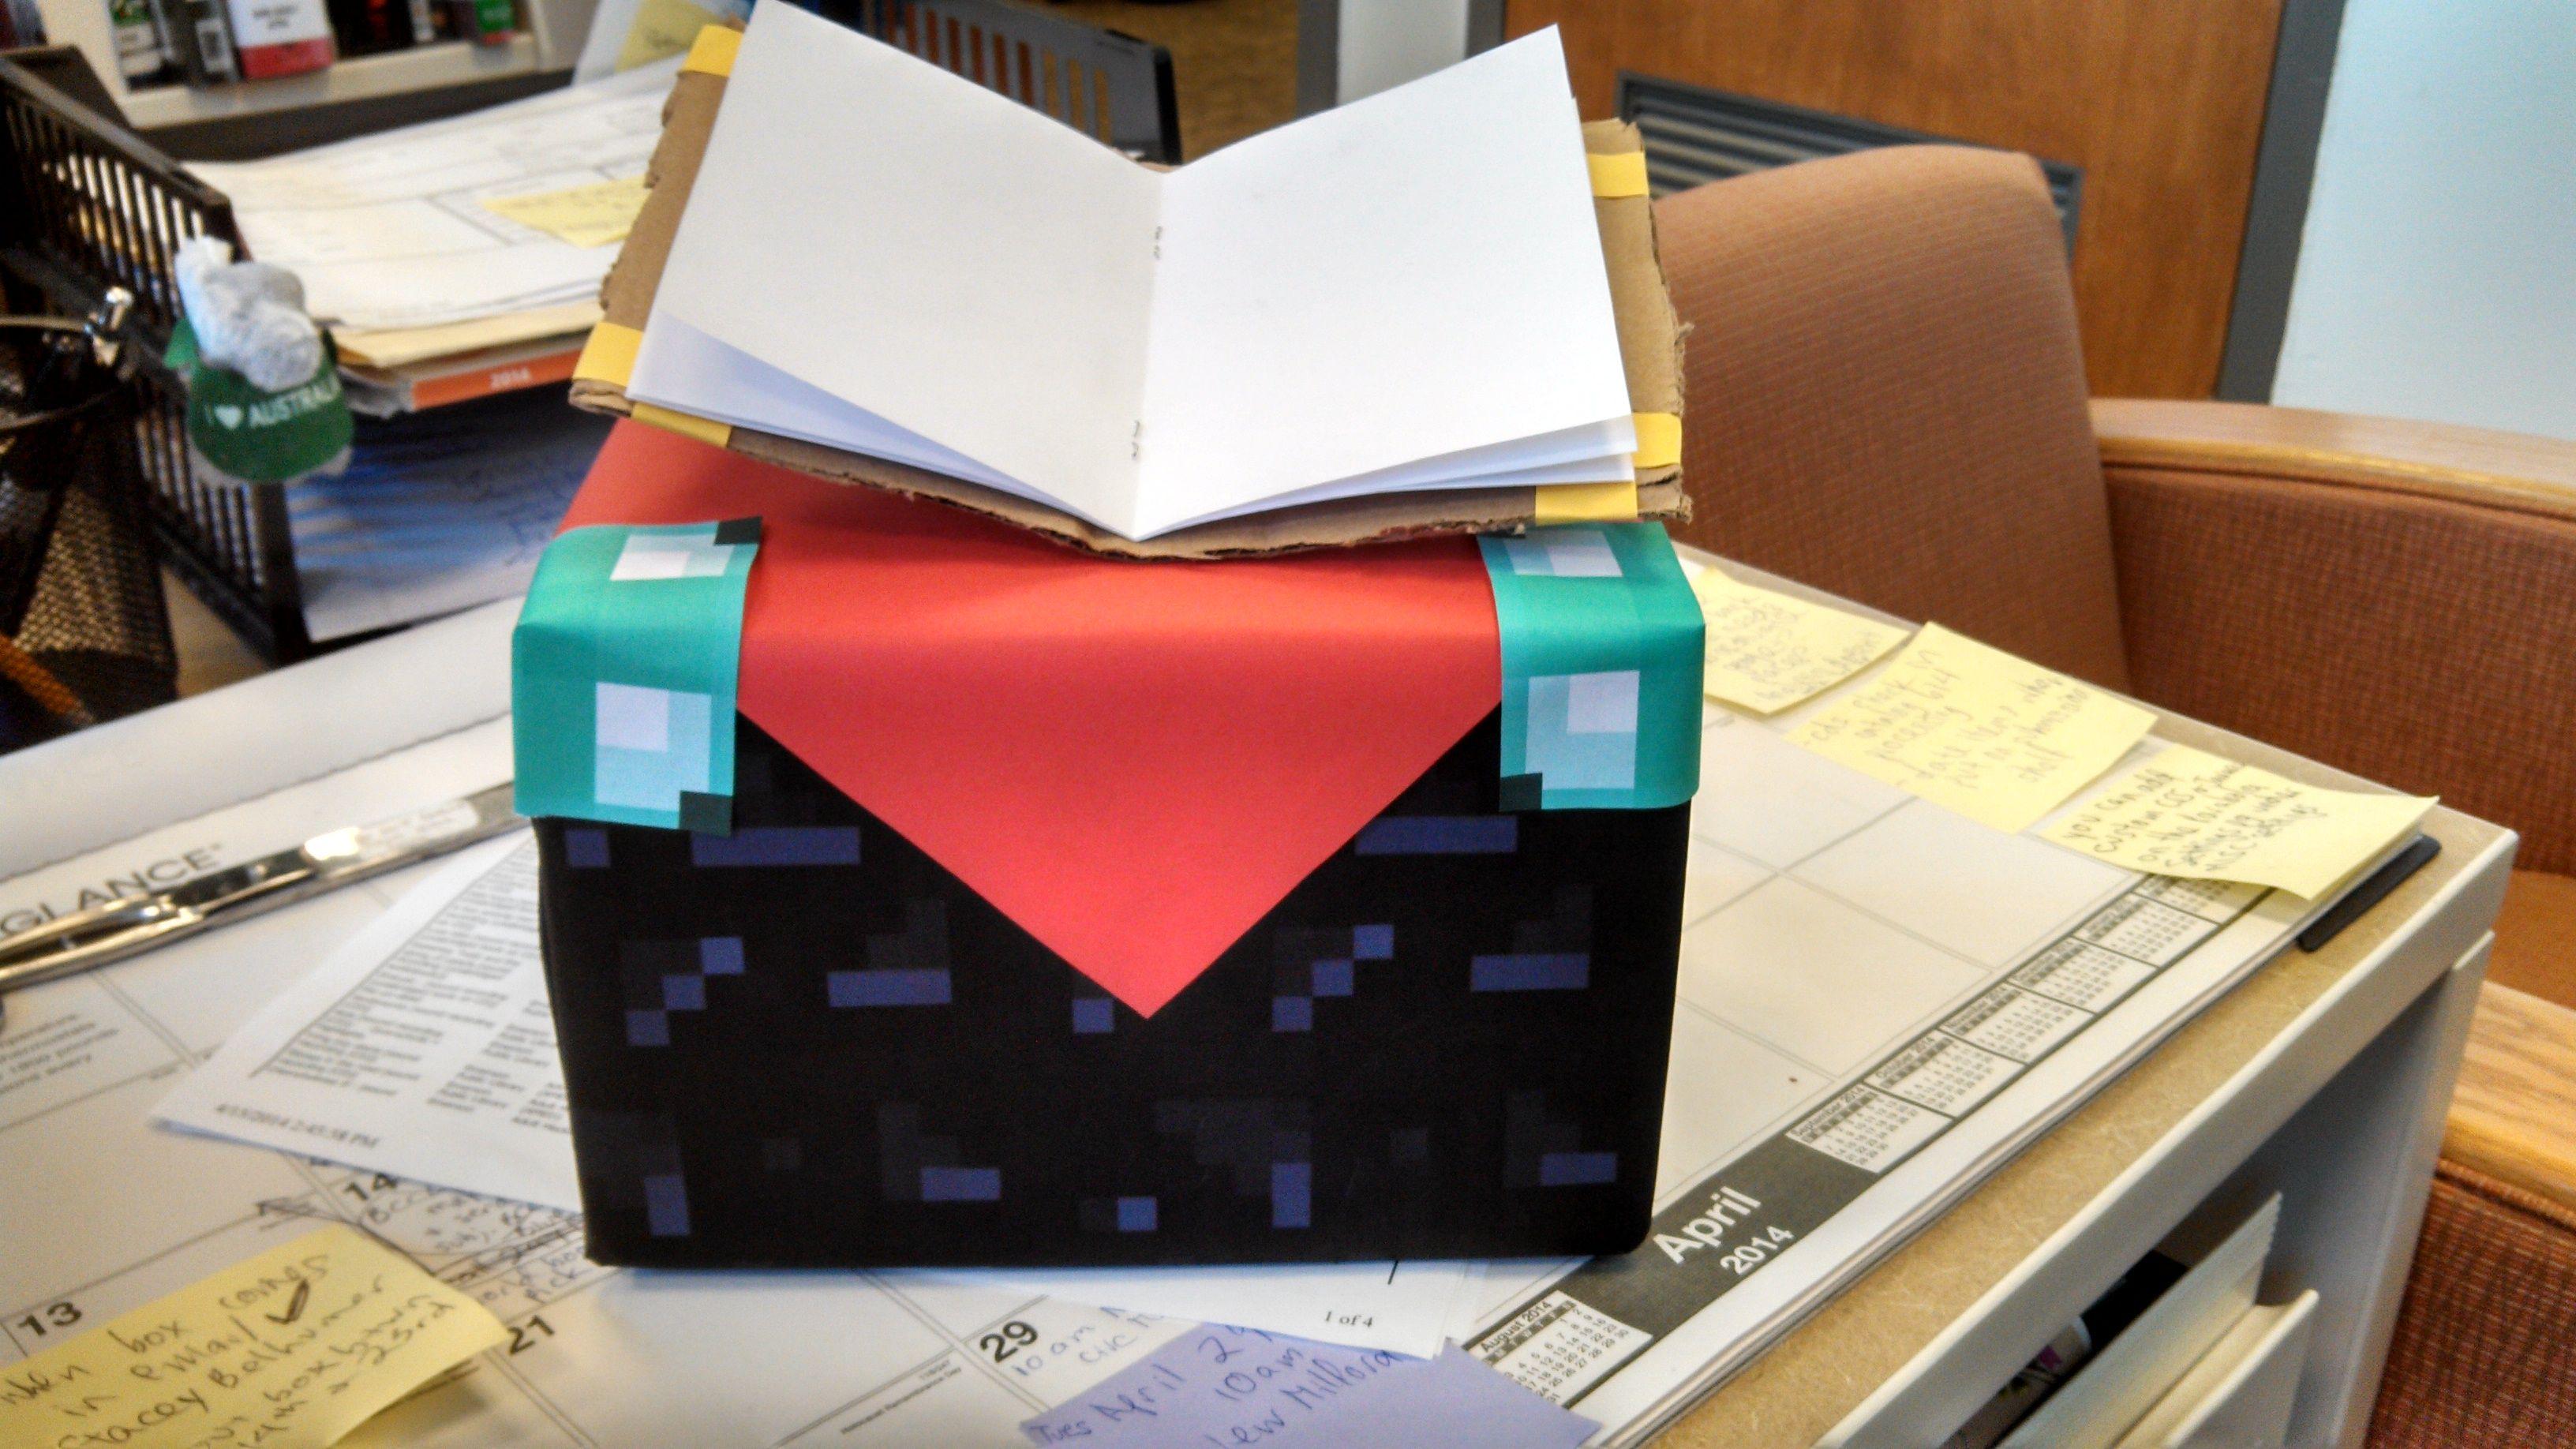 Pin By Lynda Bock On Minecraft Enchanting Table Diy Craft Table Diy Crafting Table Minecraft Craft Table